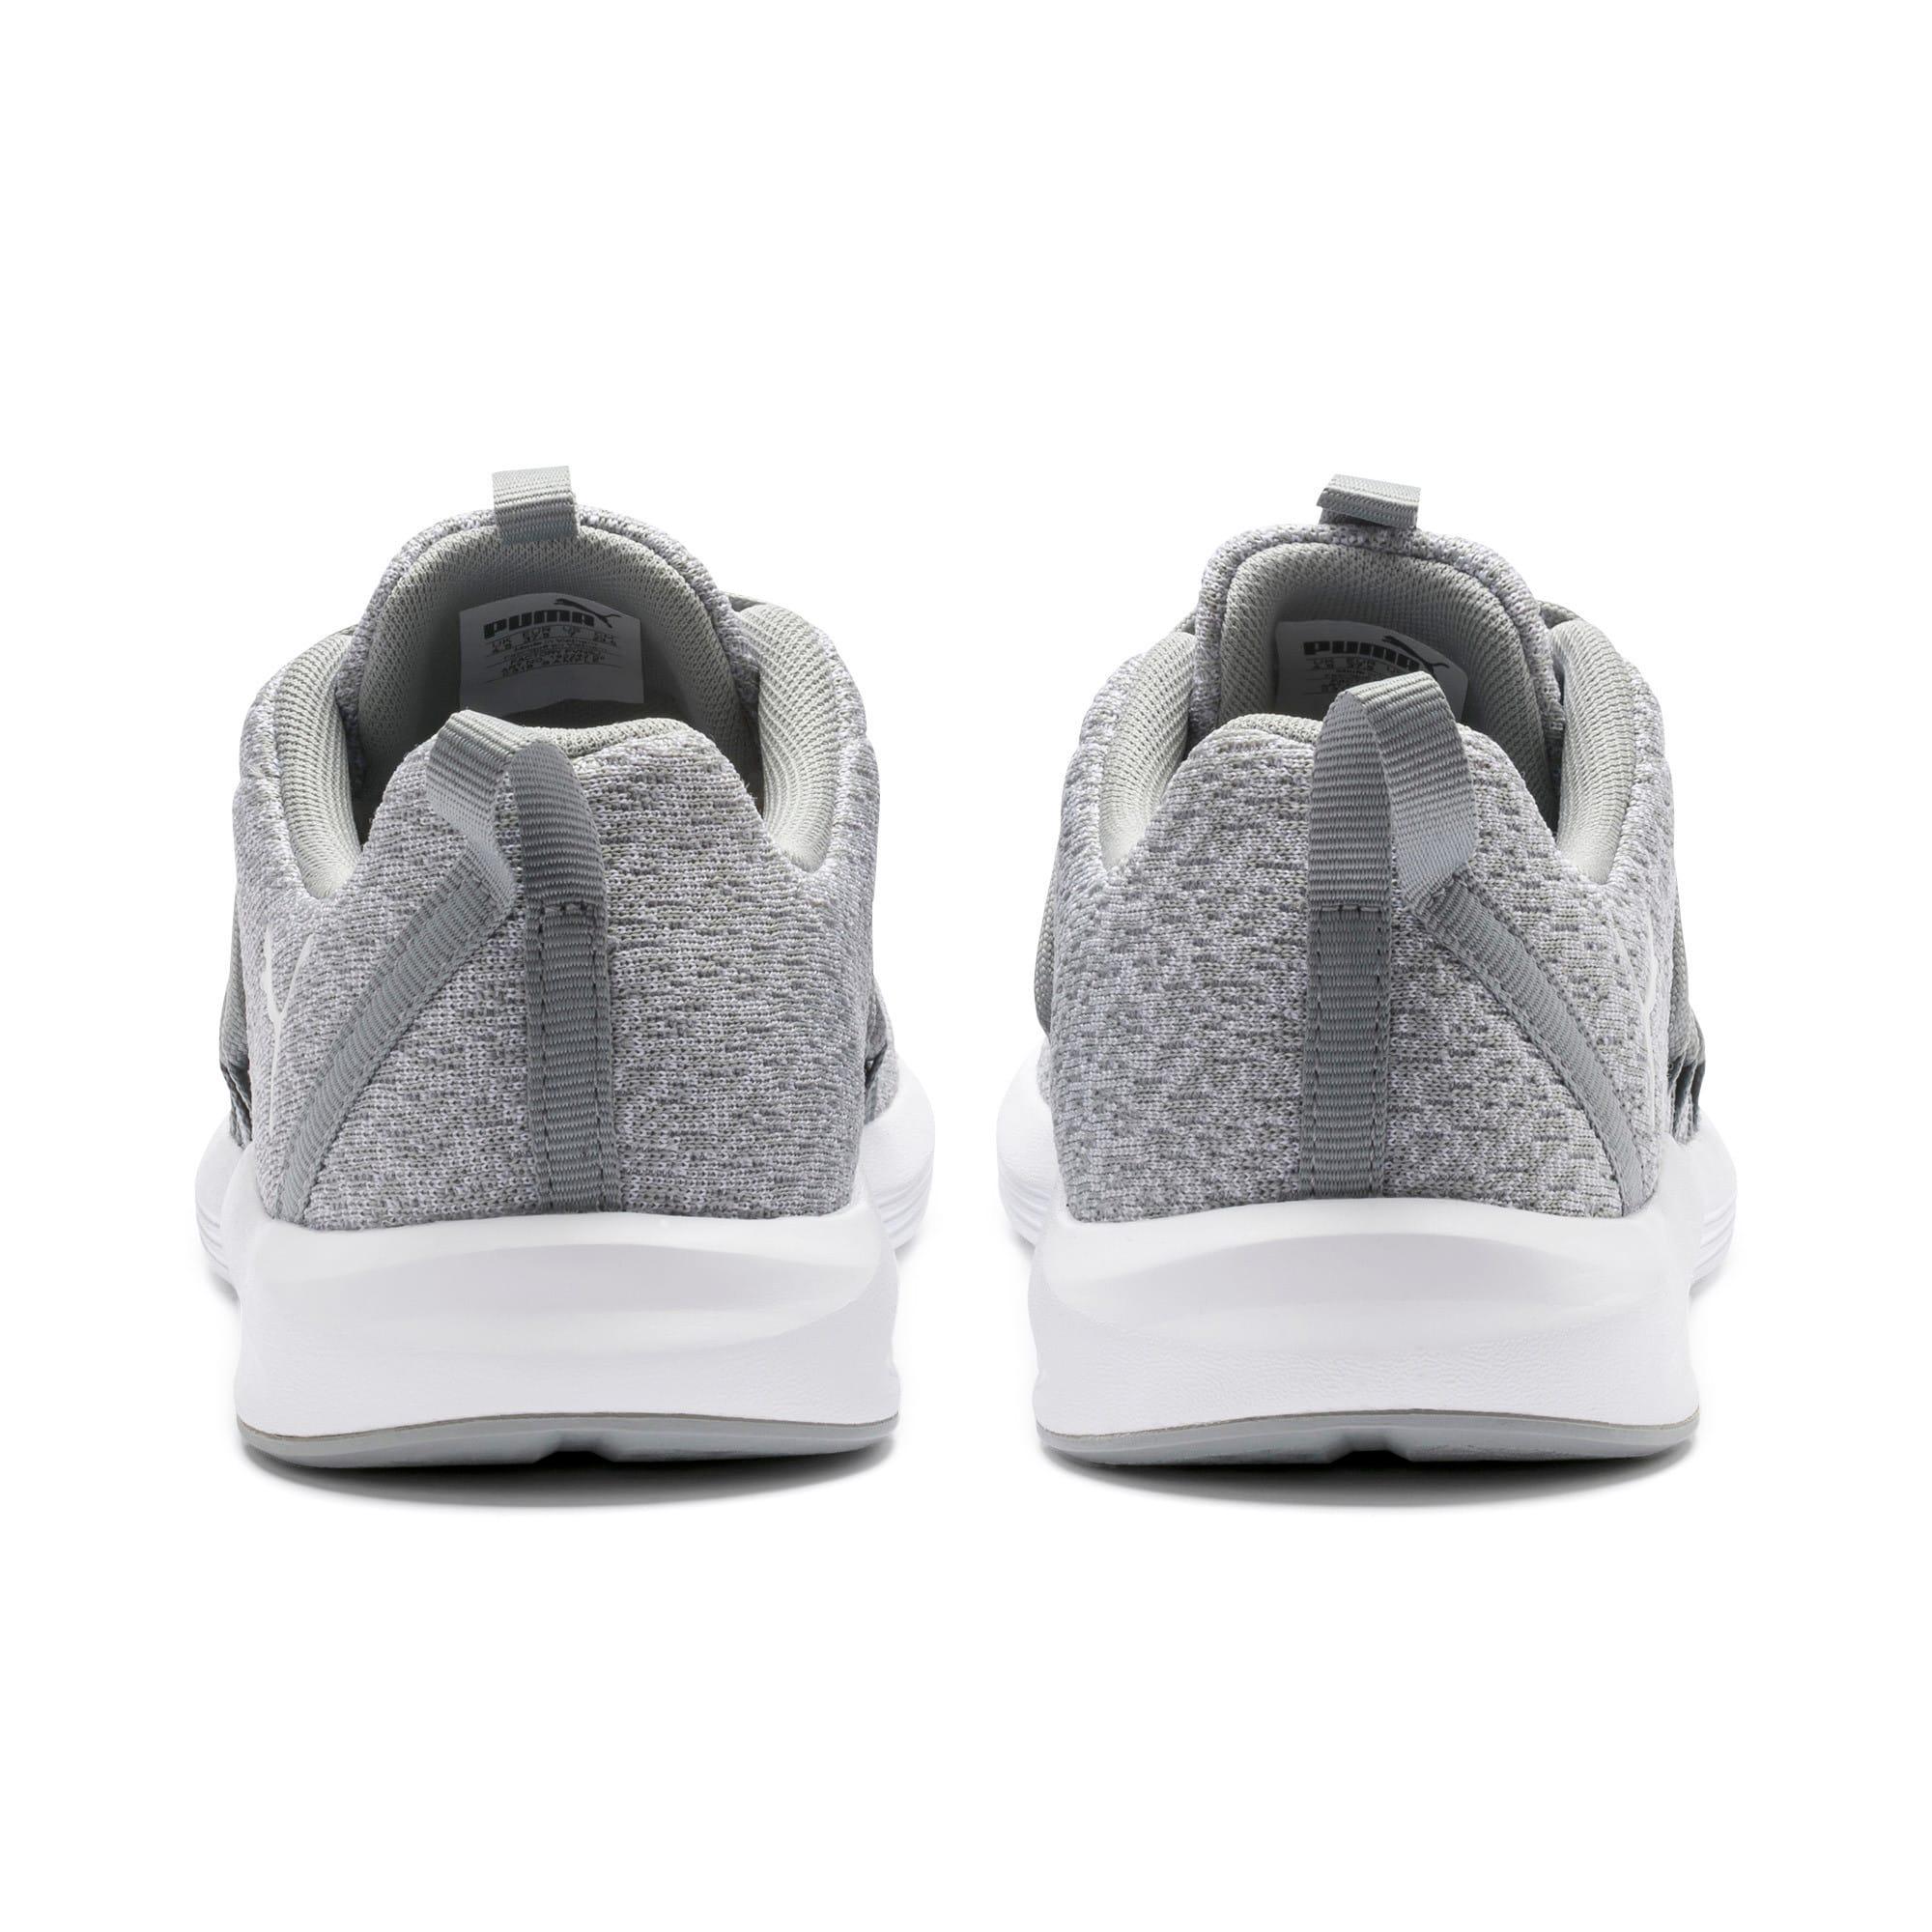 Thumbnail 4 of Prowl Alt Knit Women's Training Shoes, Quarry-Puma White, medium